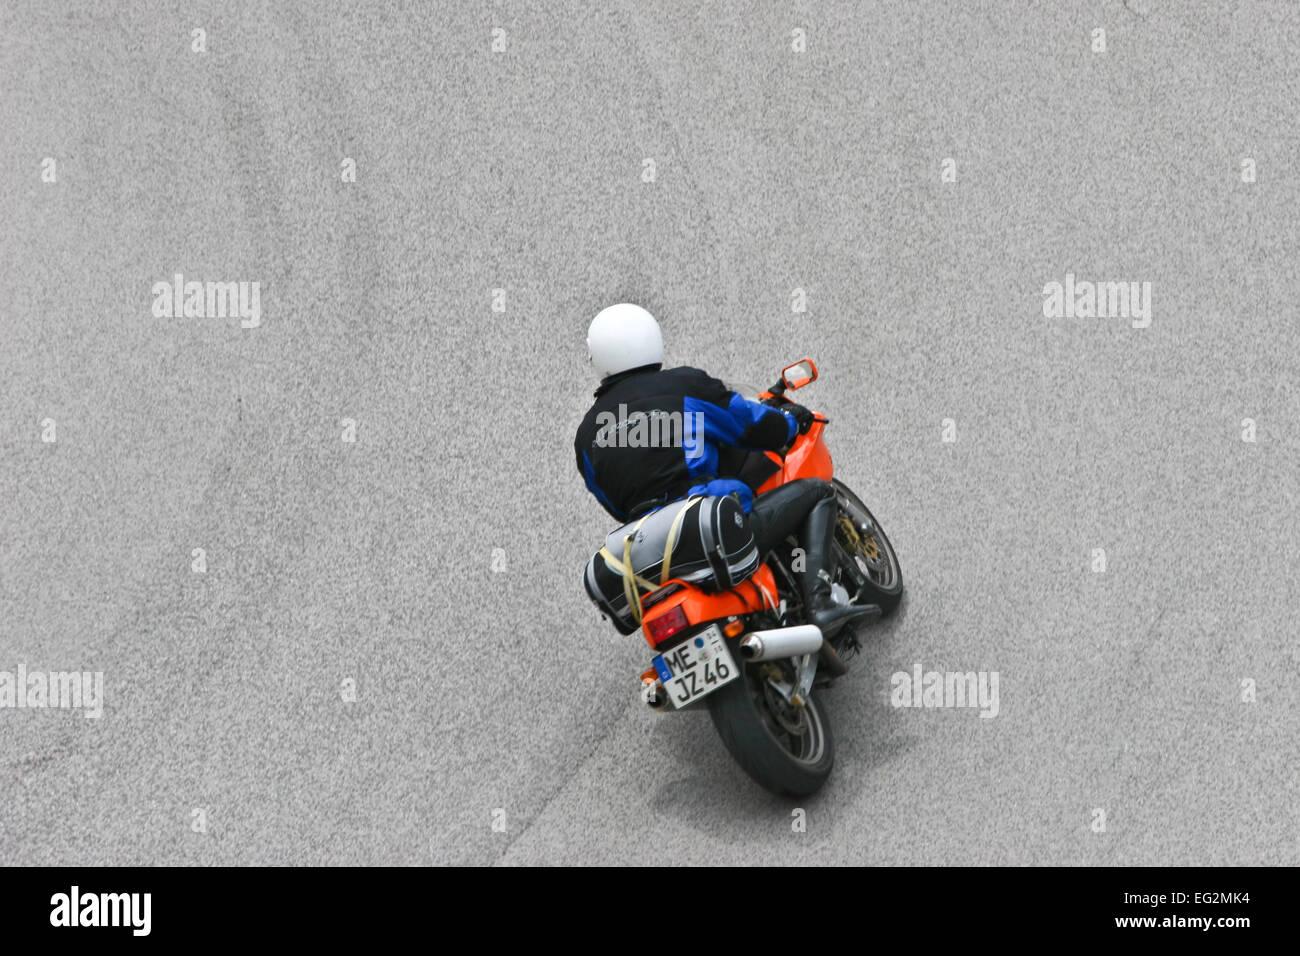 Ducati in the italian alps - Stock Image